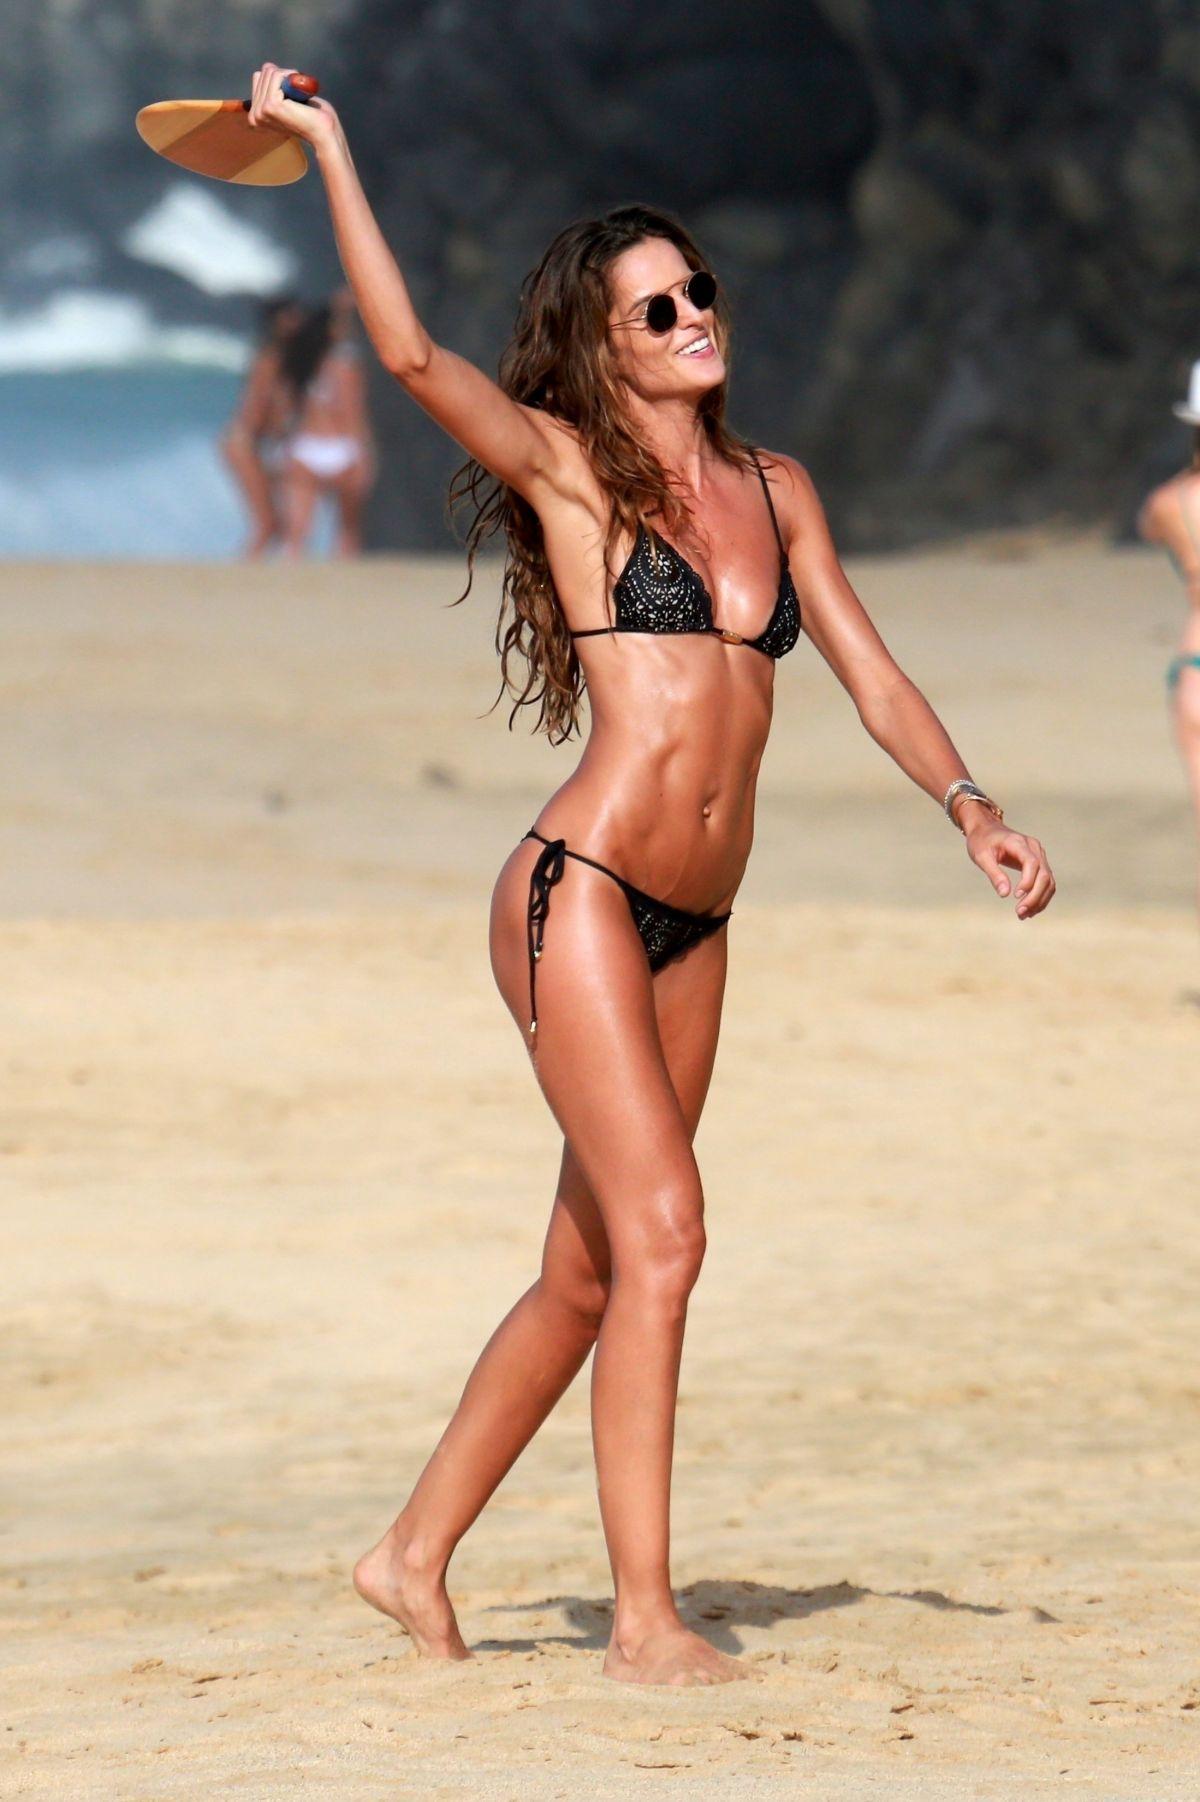 Izabel Goulart in Bikini and Kevin Trapp on the beach in Fernando de Noronha Pic 6 of 35